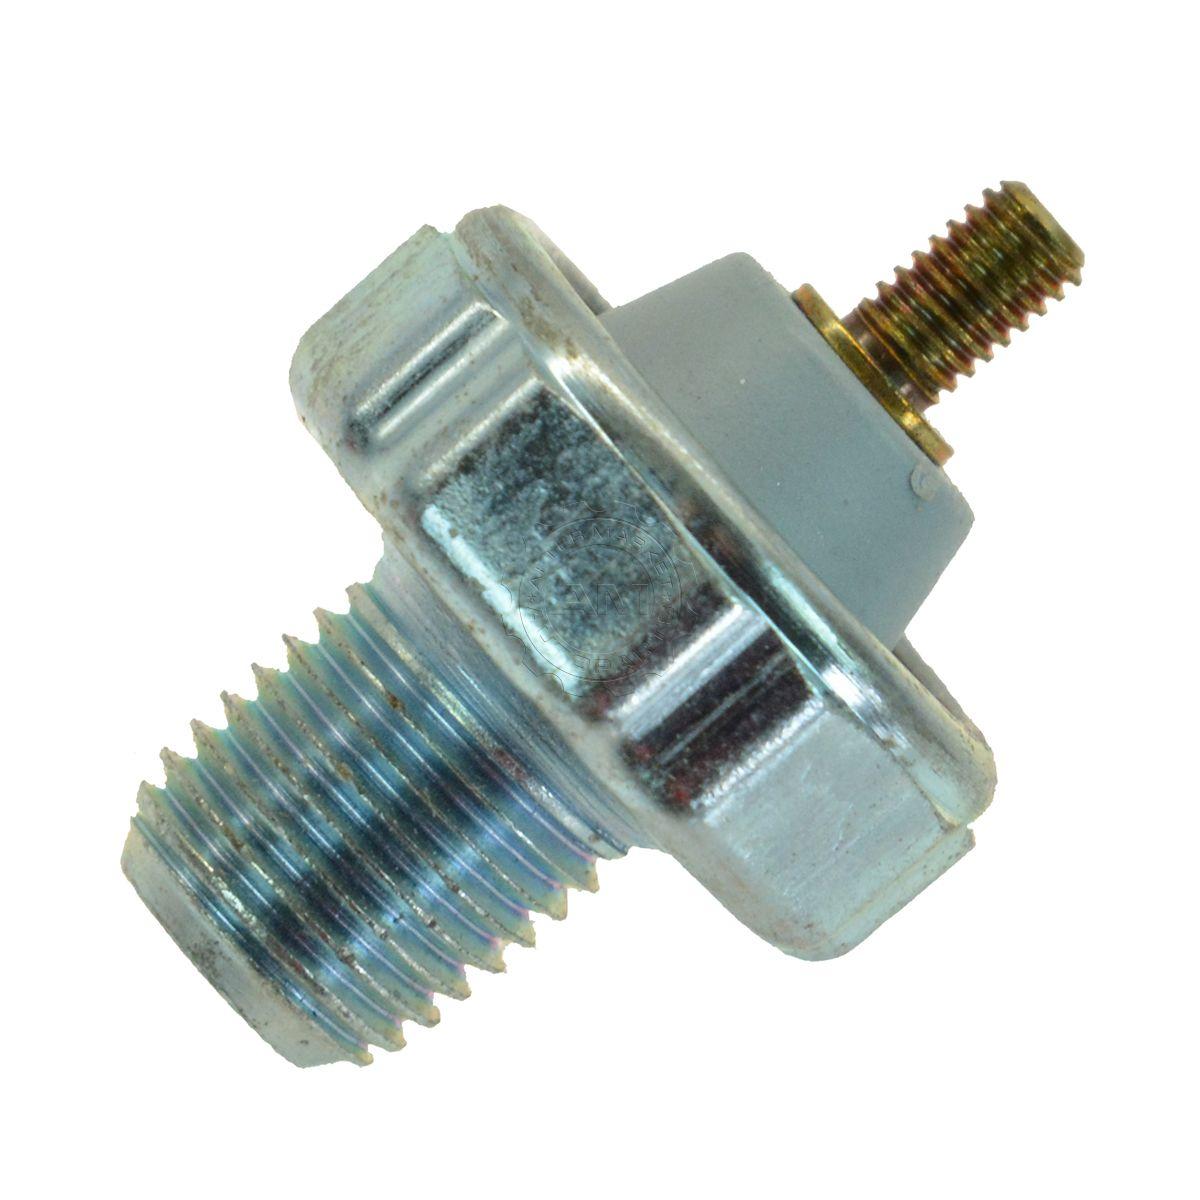 hight resolution of oil pressure sensor sender switch for ford lincoln mazda mercury merkur saab